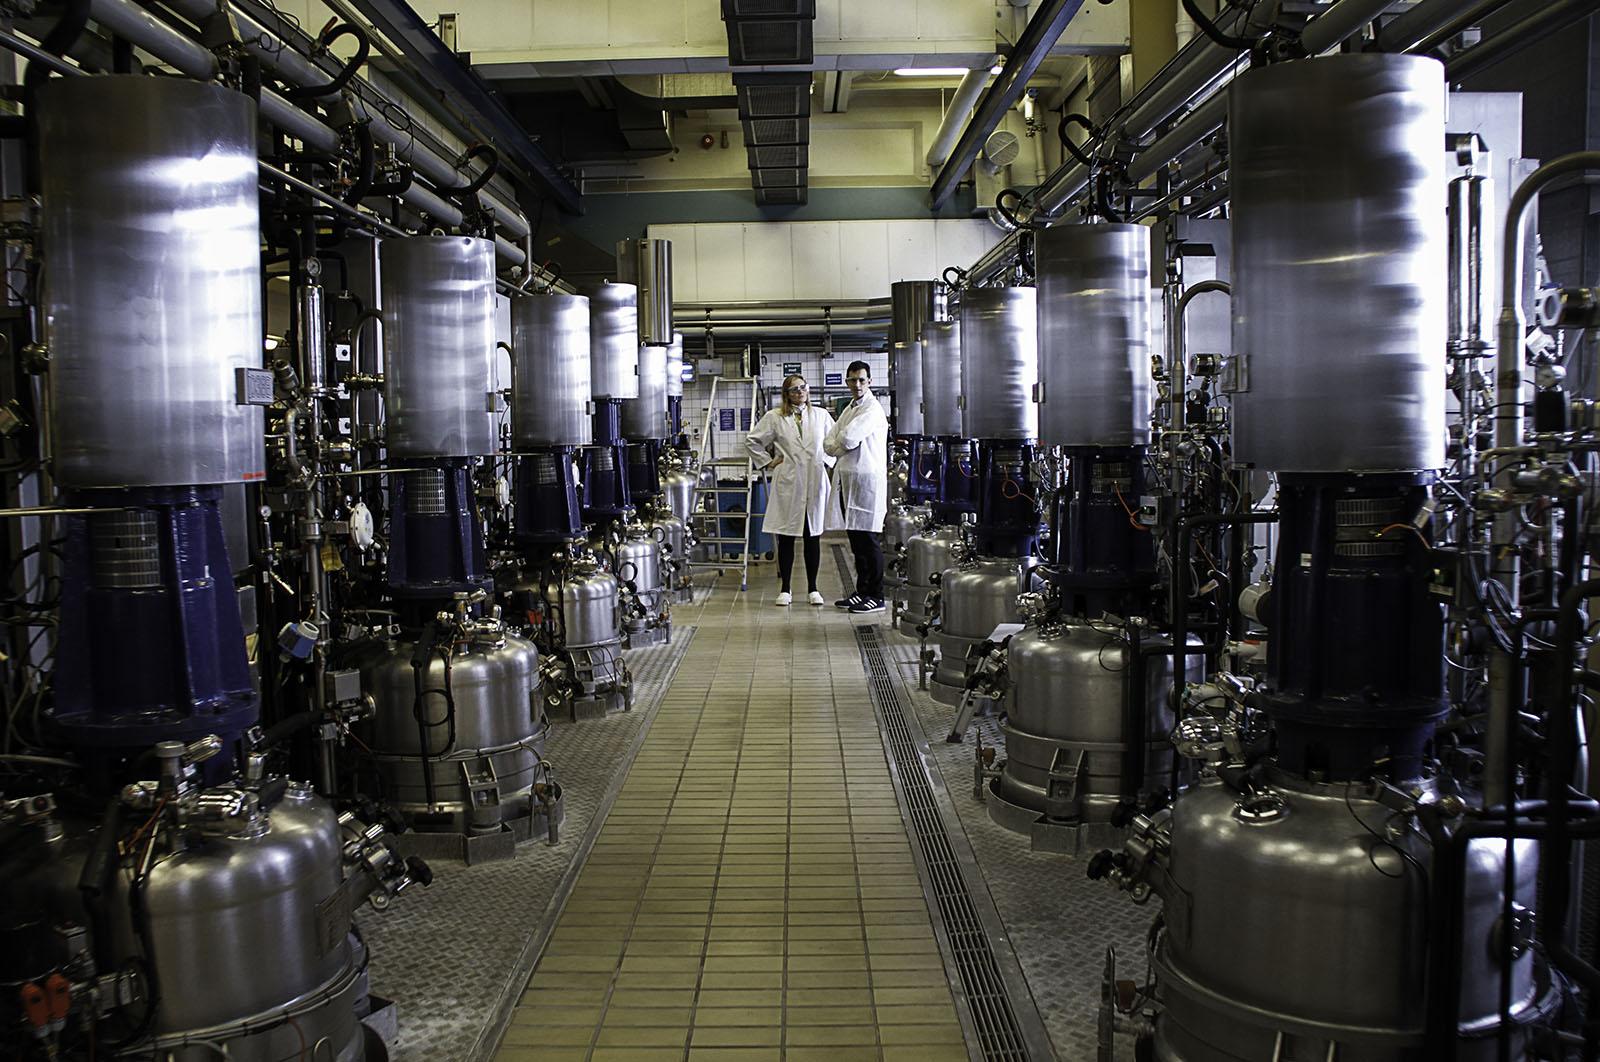 Inspection of enzymes fermenter tanks